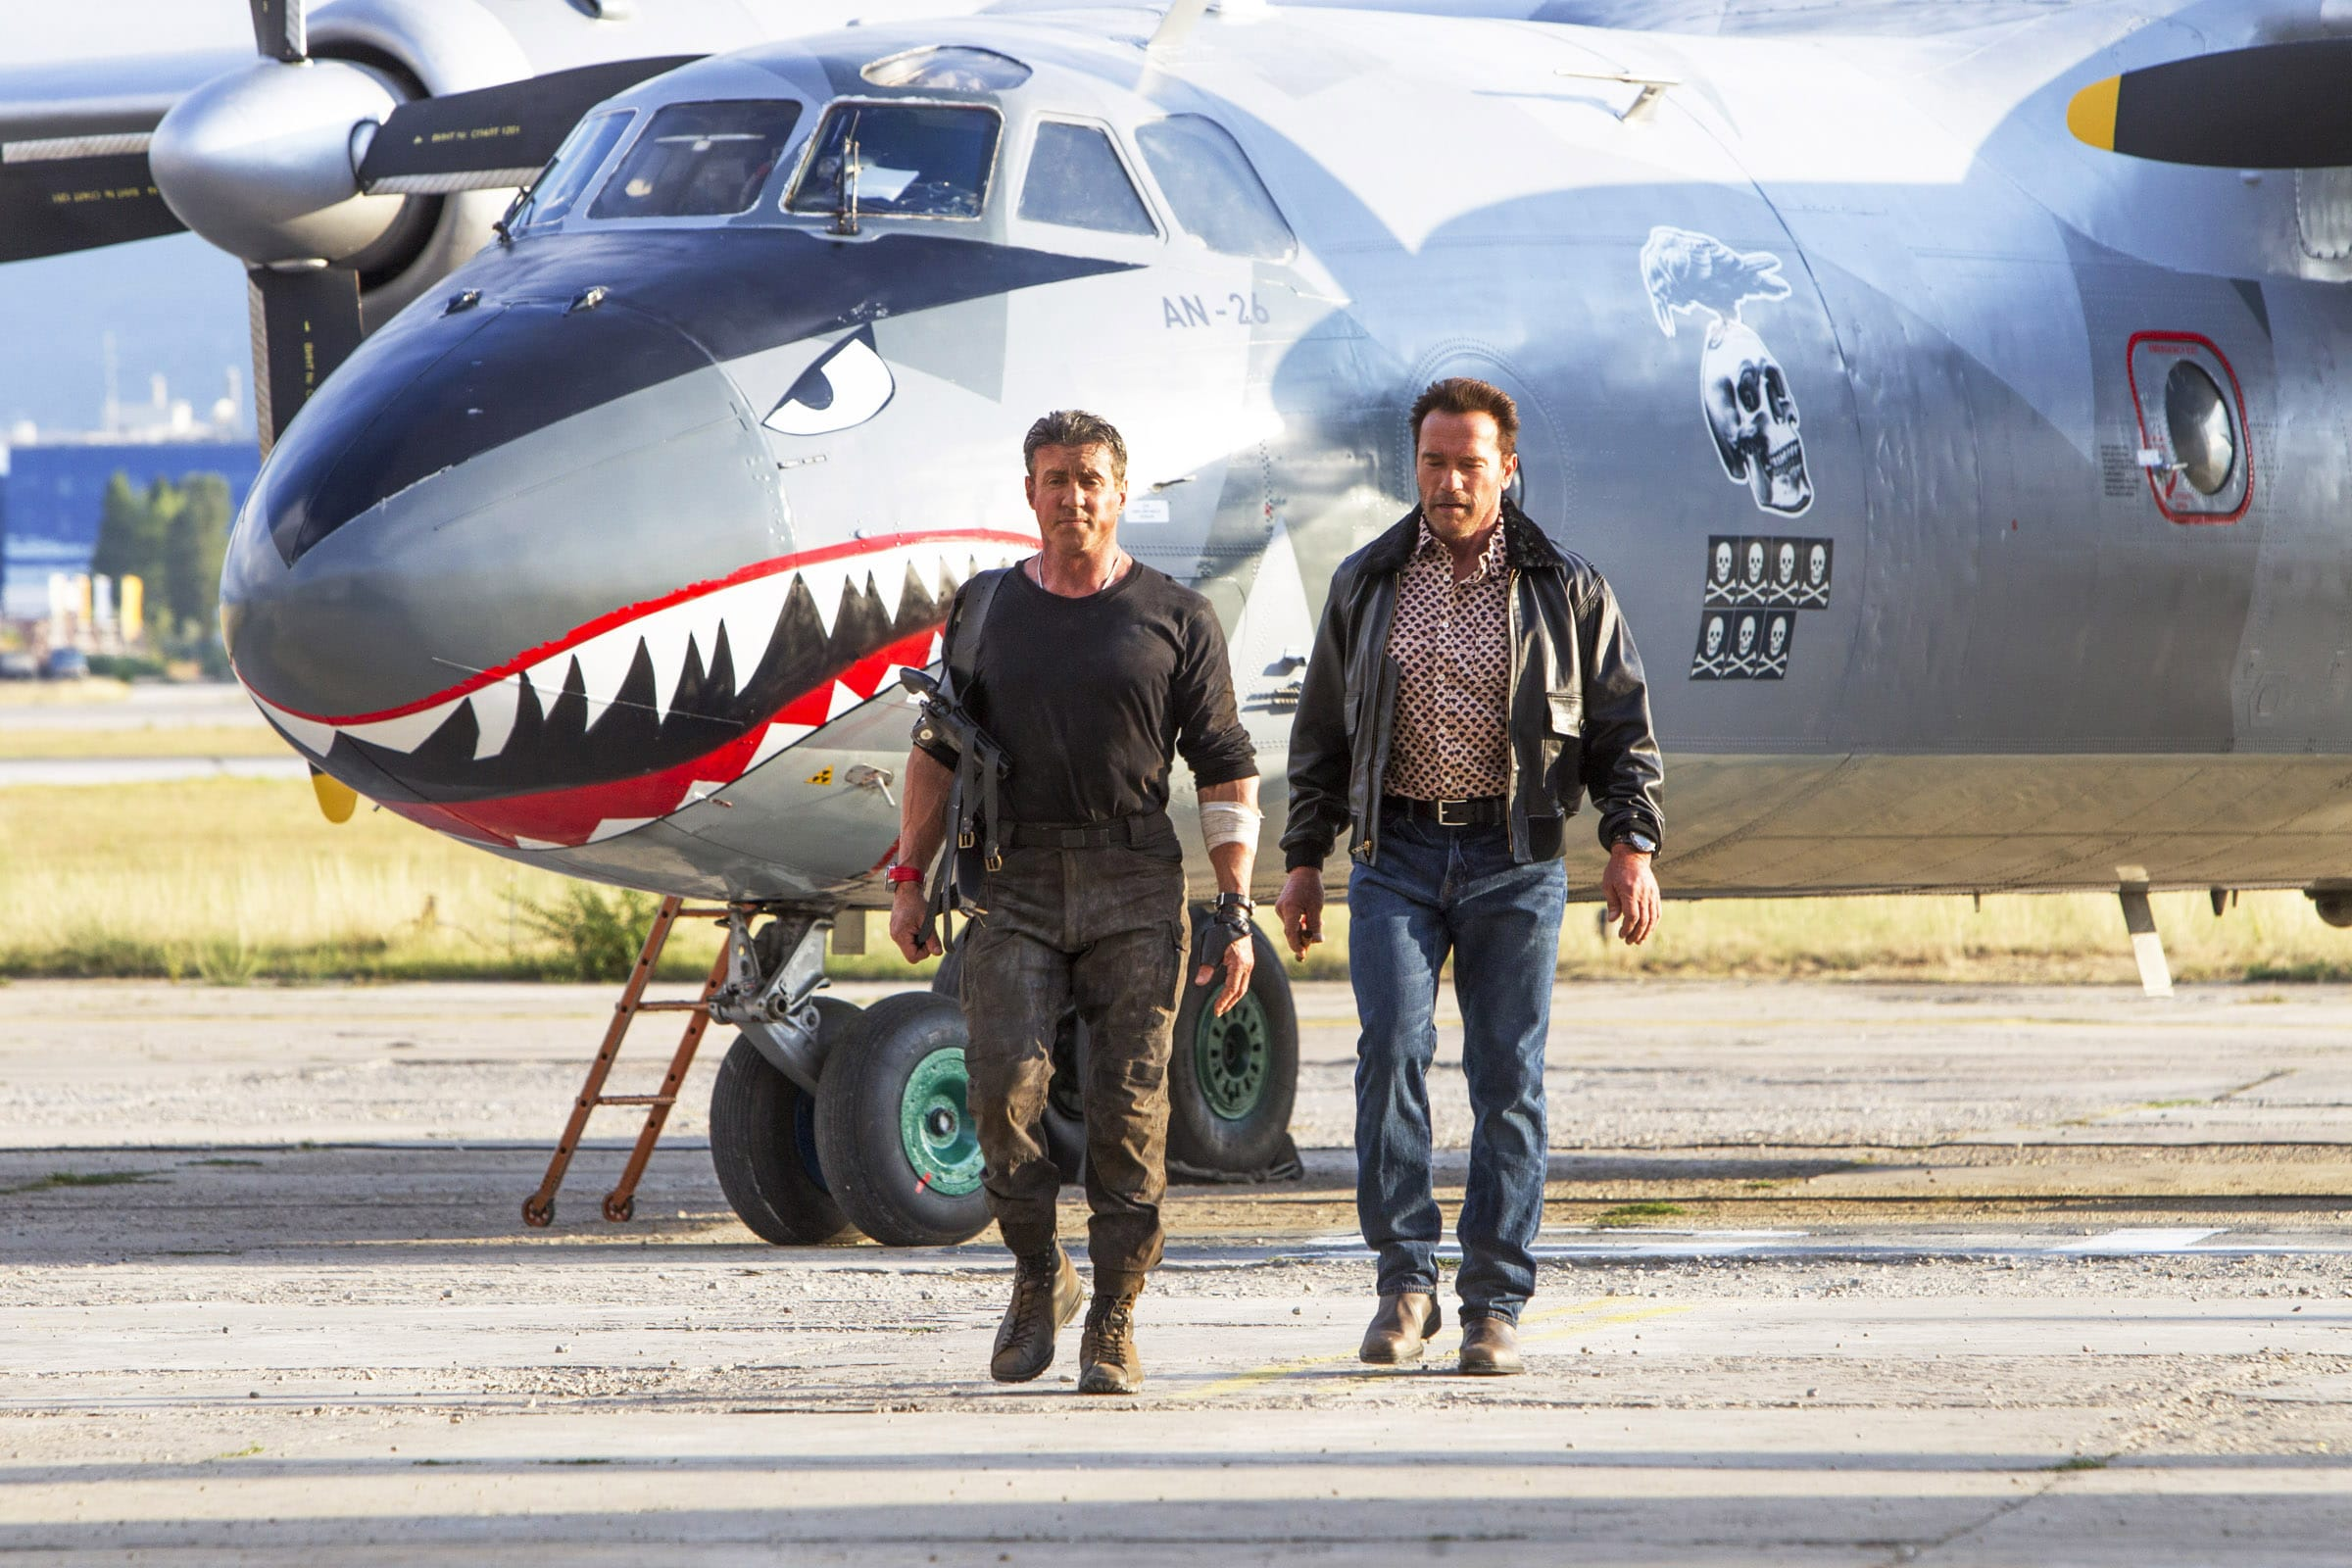 THE EXPENDABLES 3, from left: Sylvester Stallone, Arnold Schwarzenegger, 2014